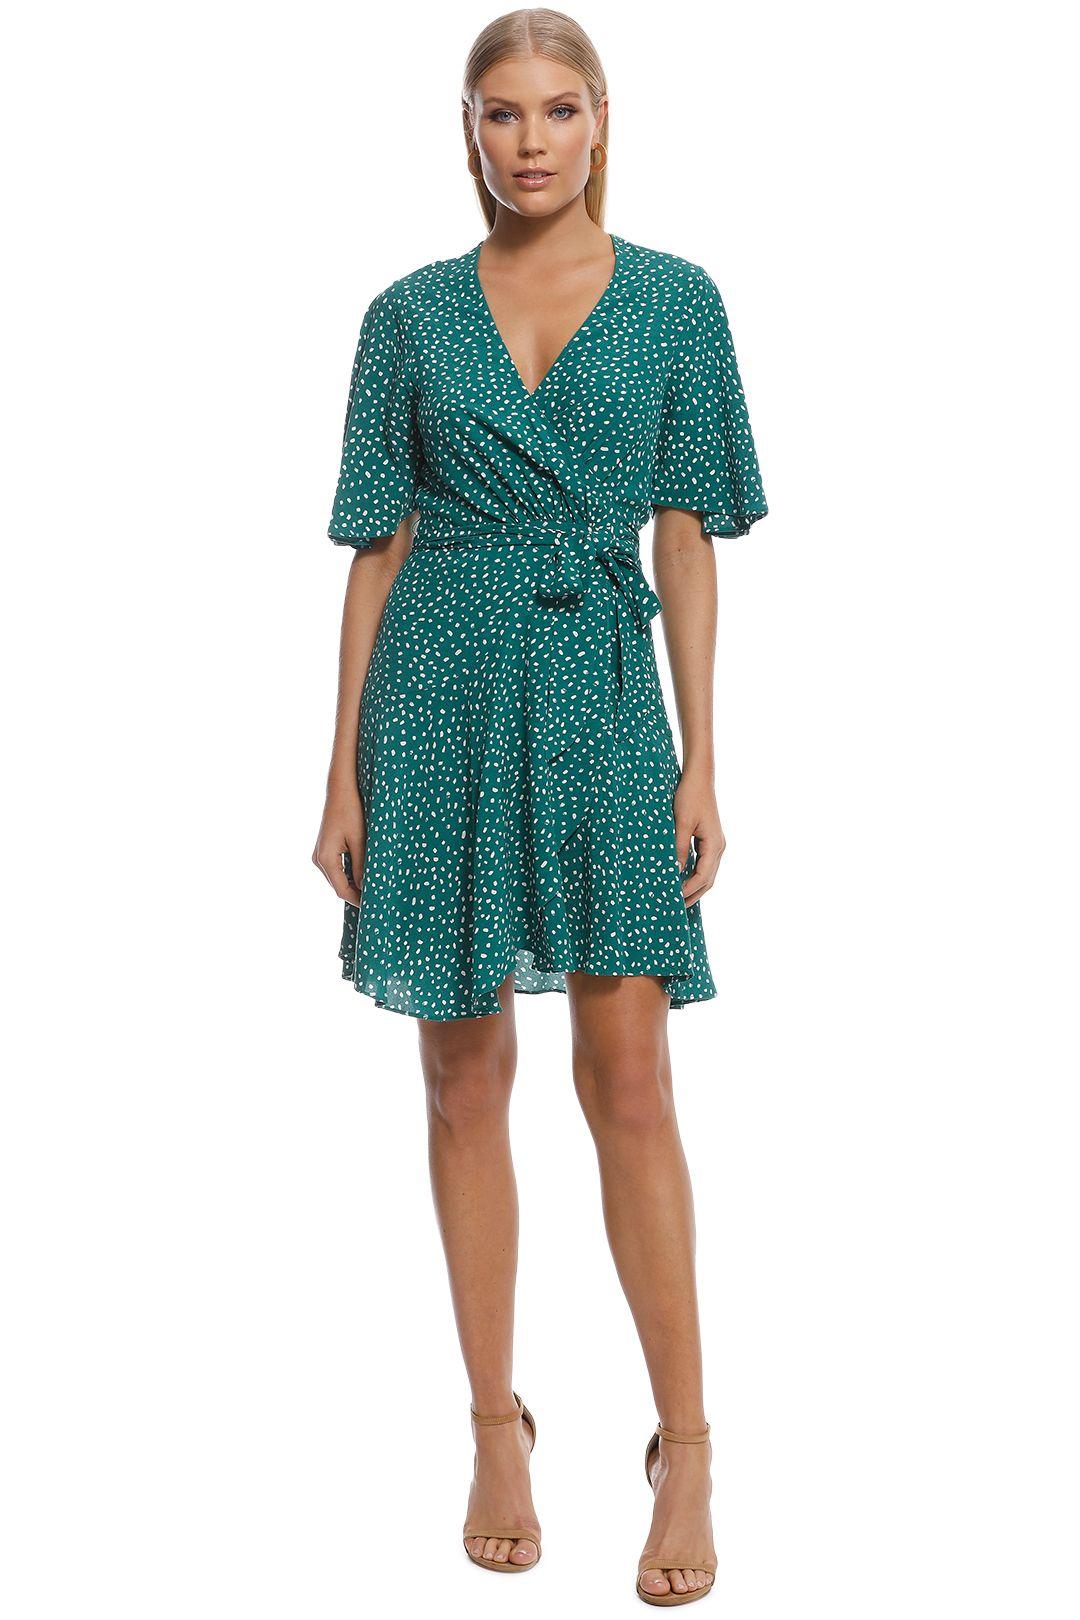 Rodeo Show - Sara Spot Mini Dress - Green - Front